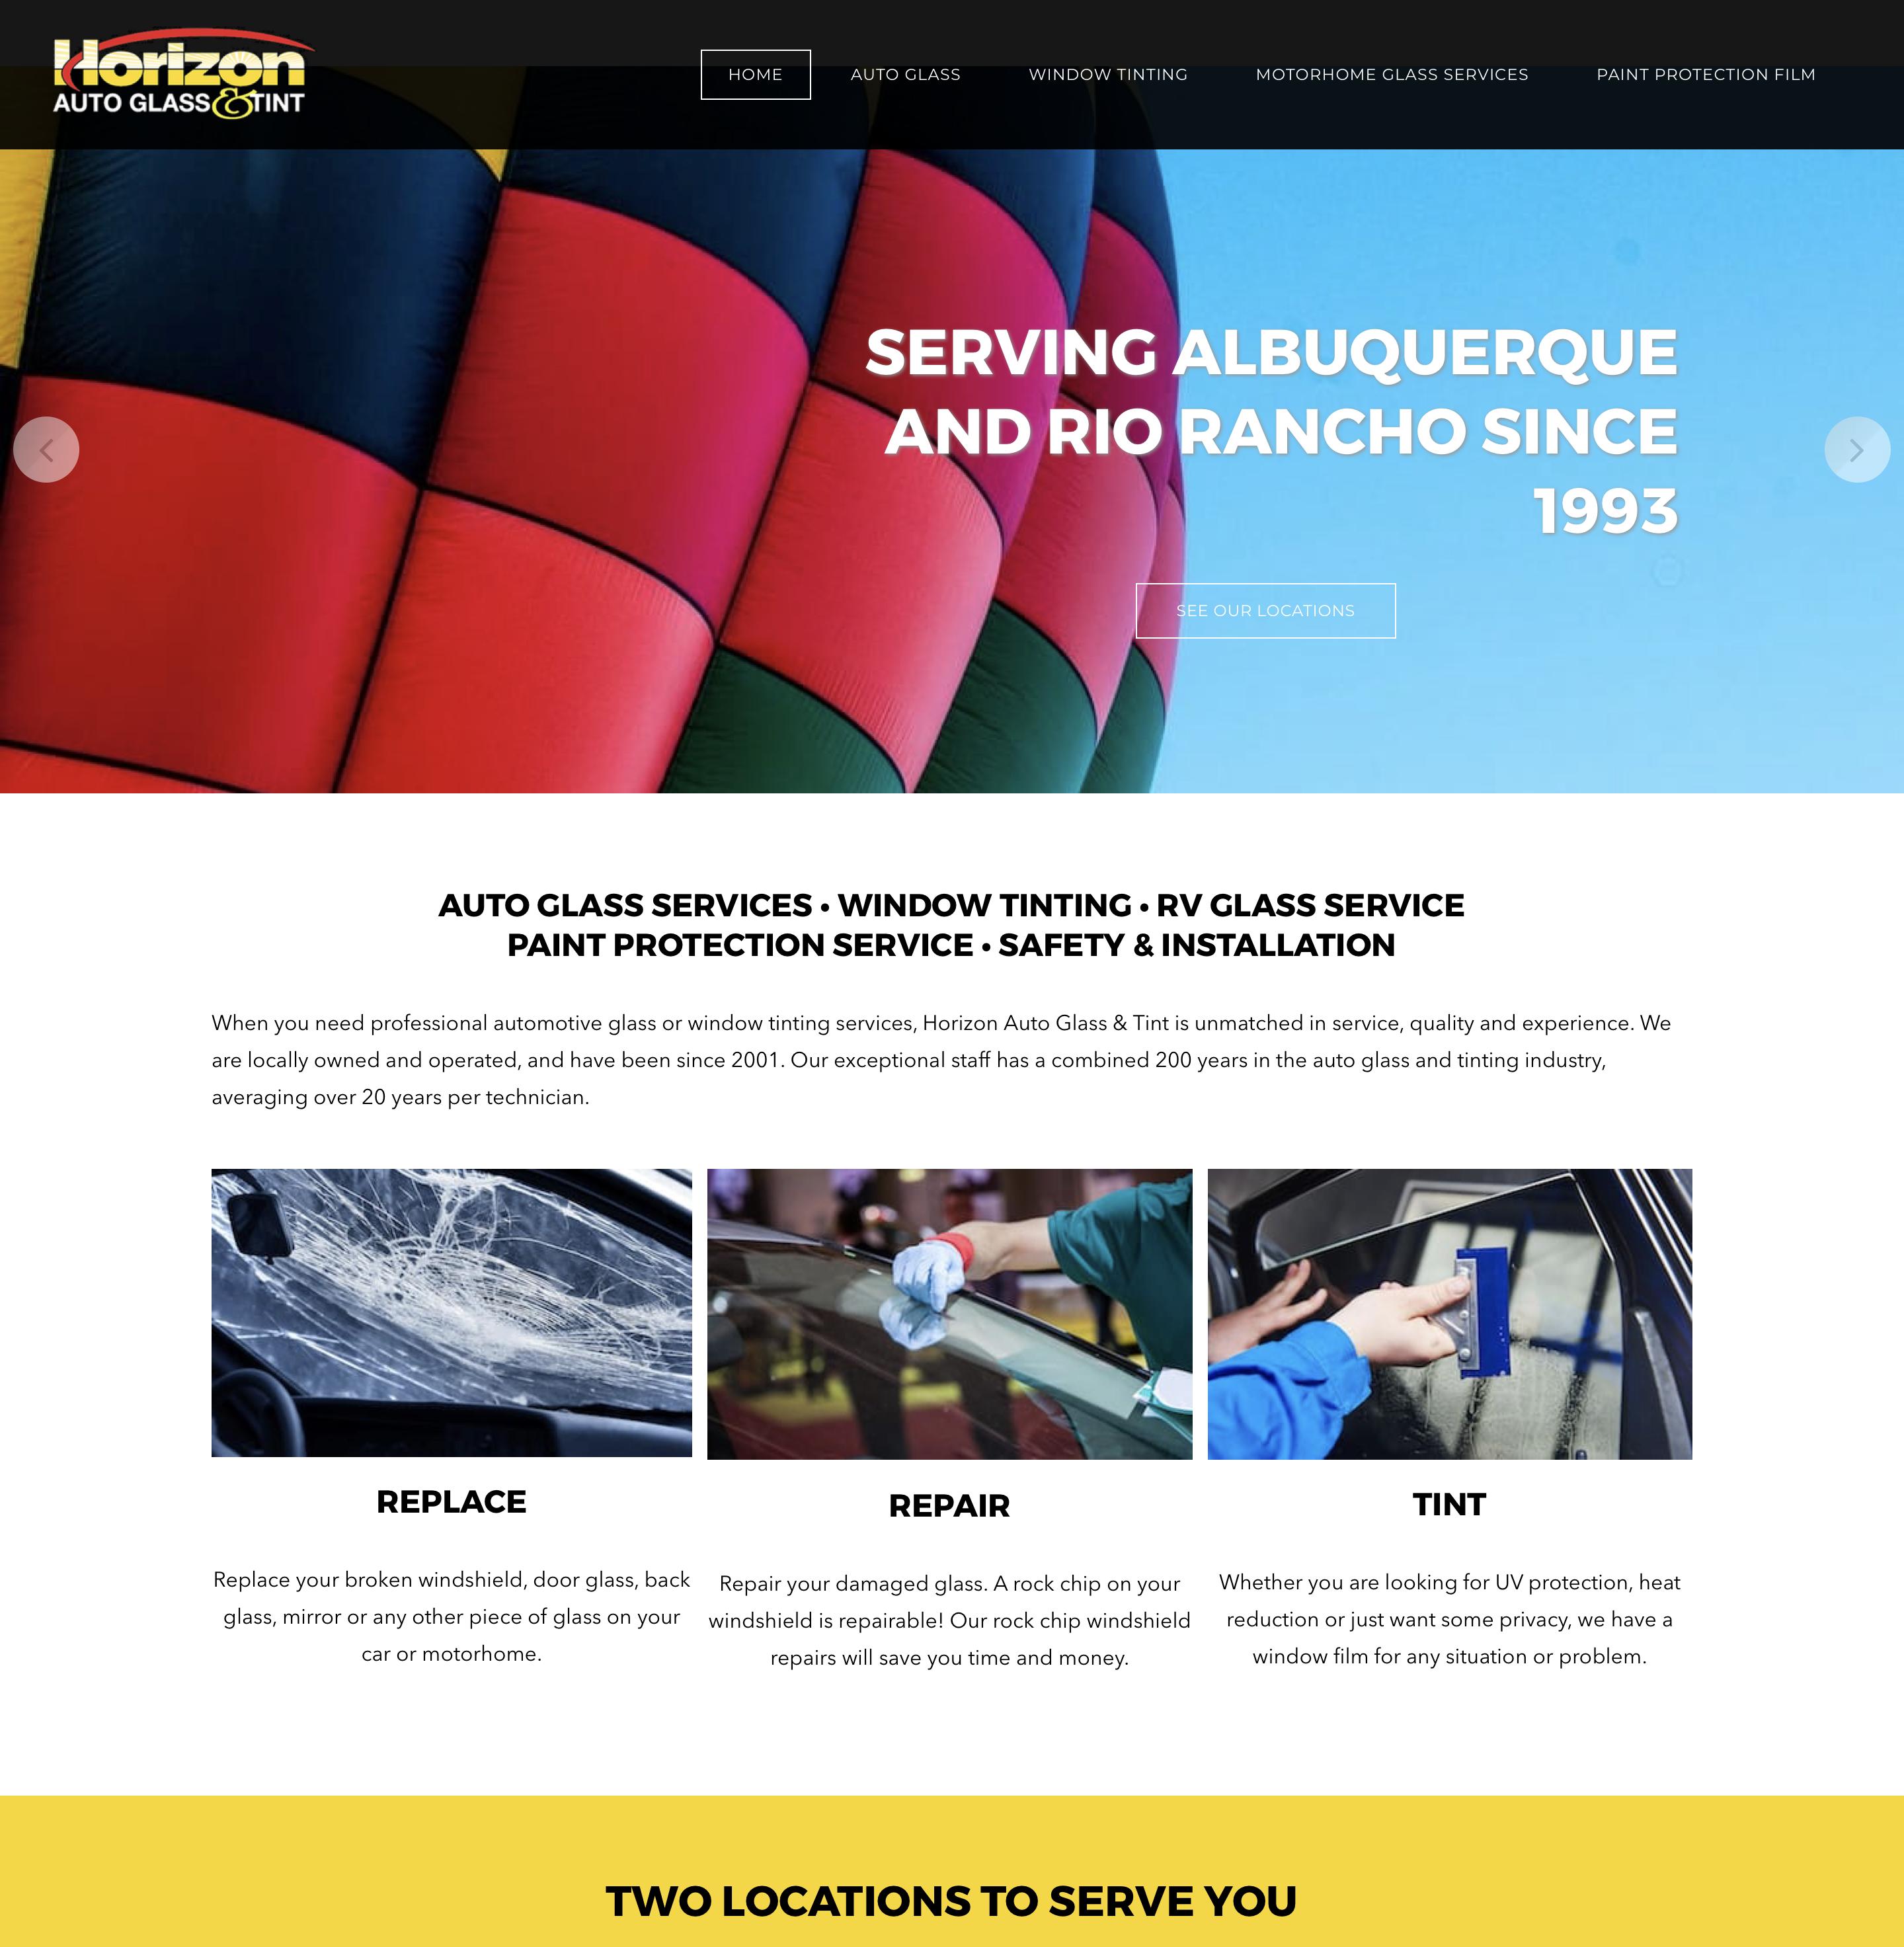 HorizonAbq.com